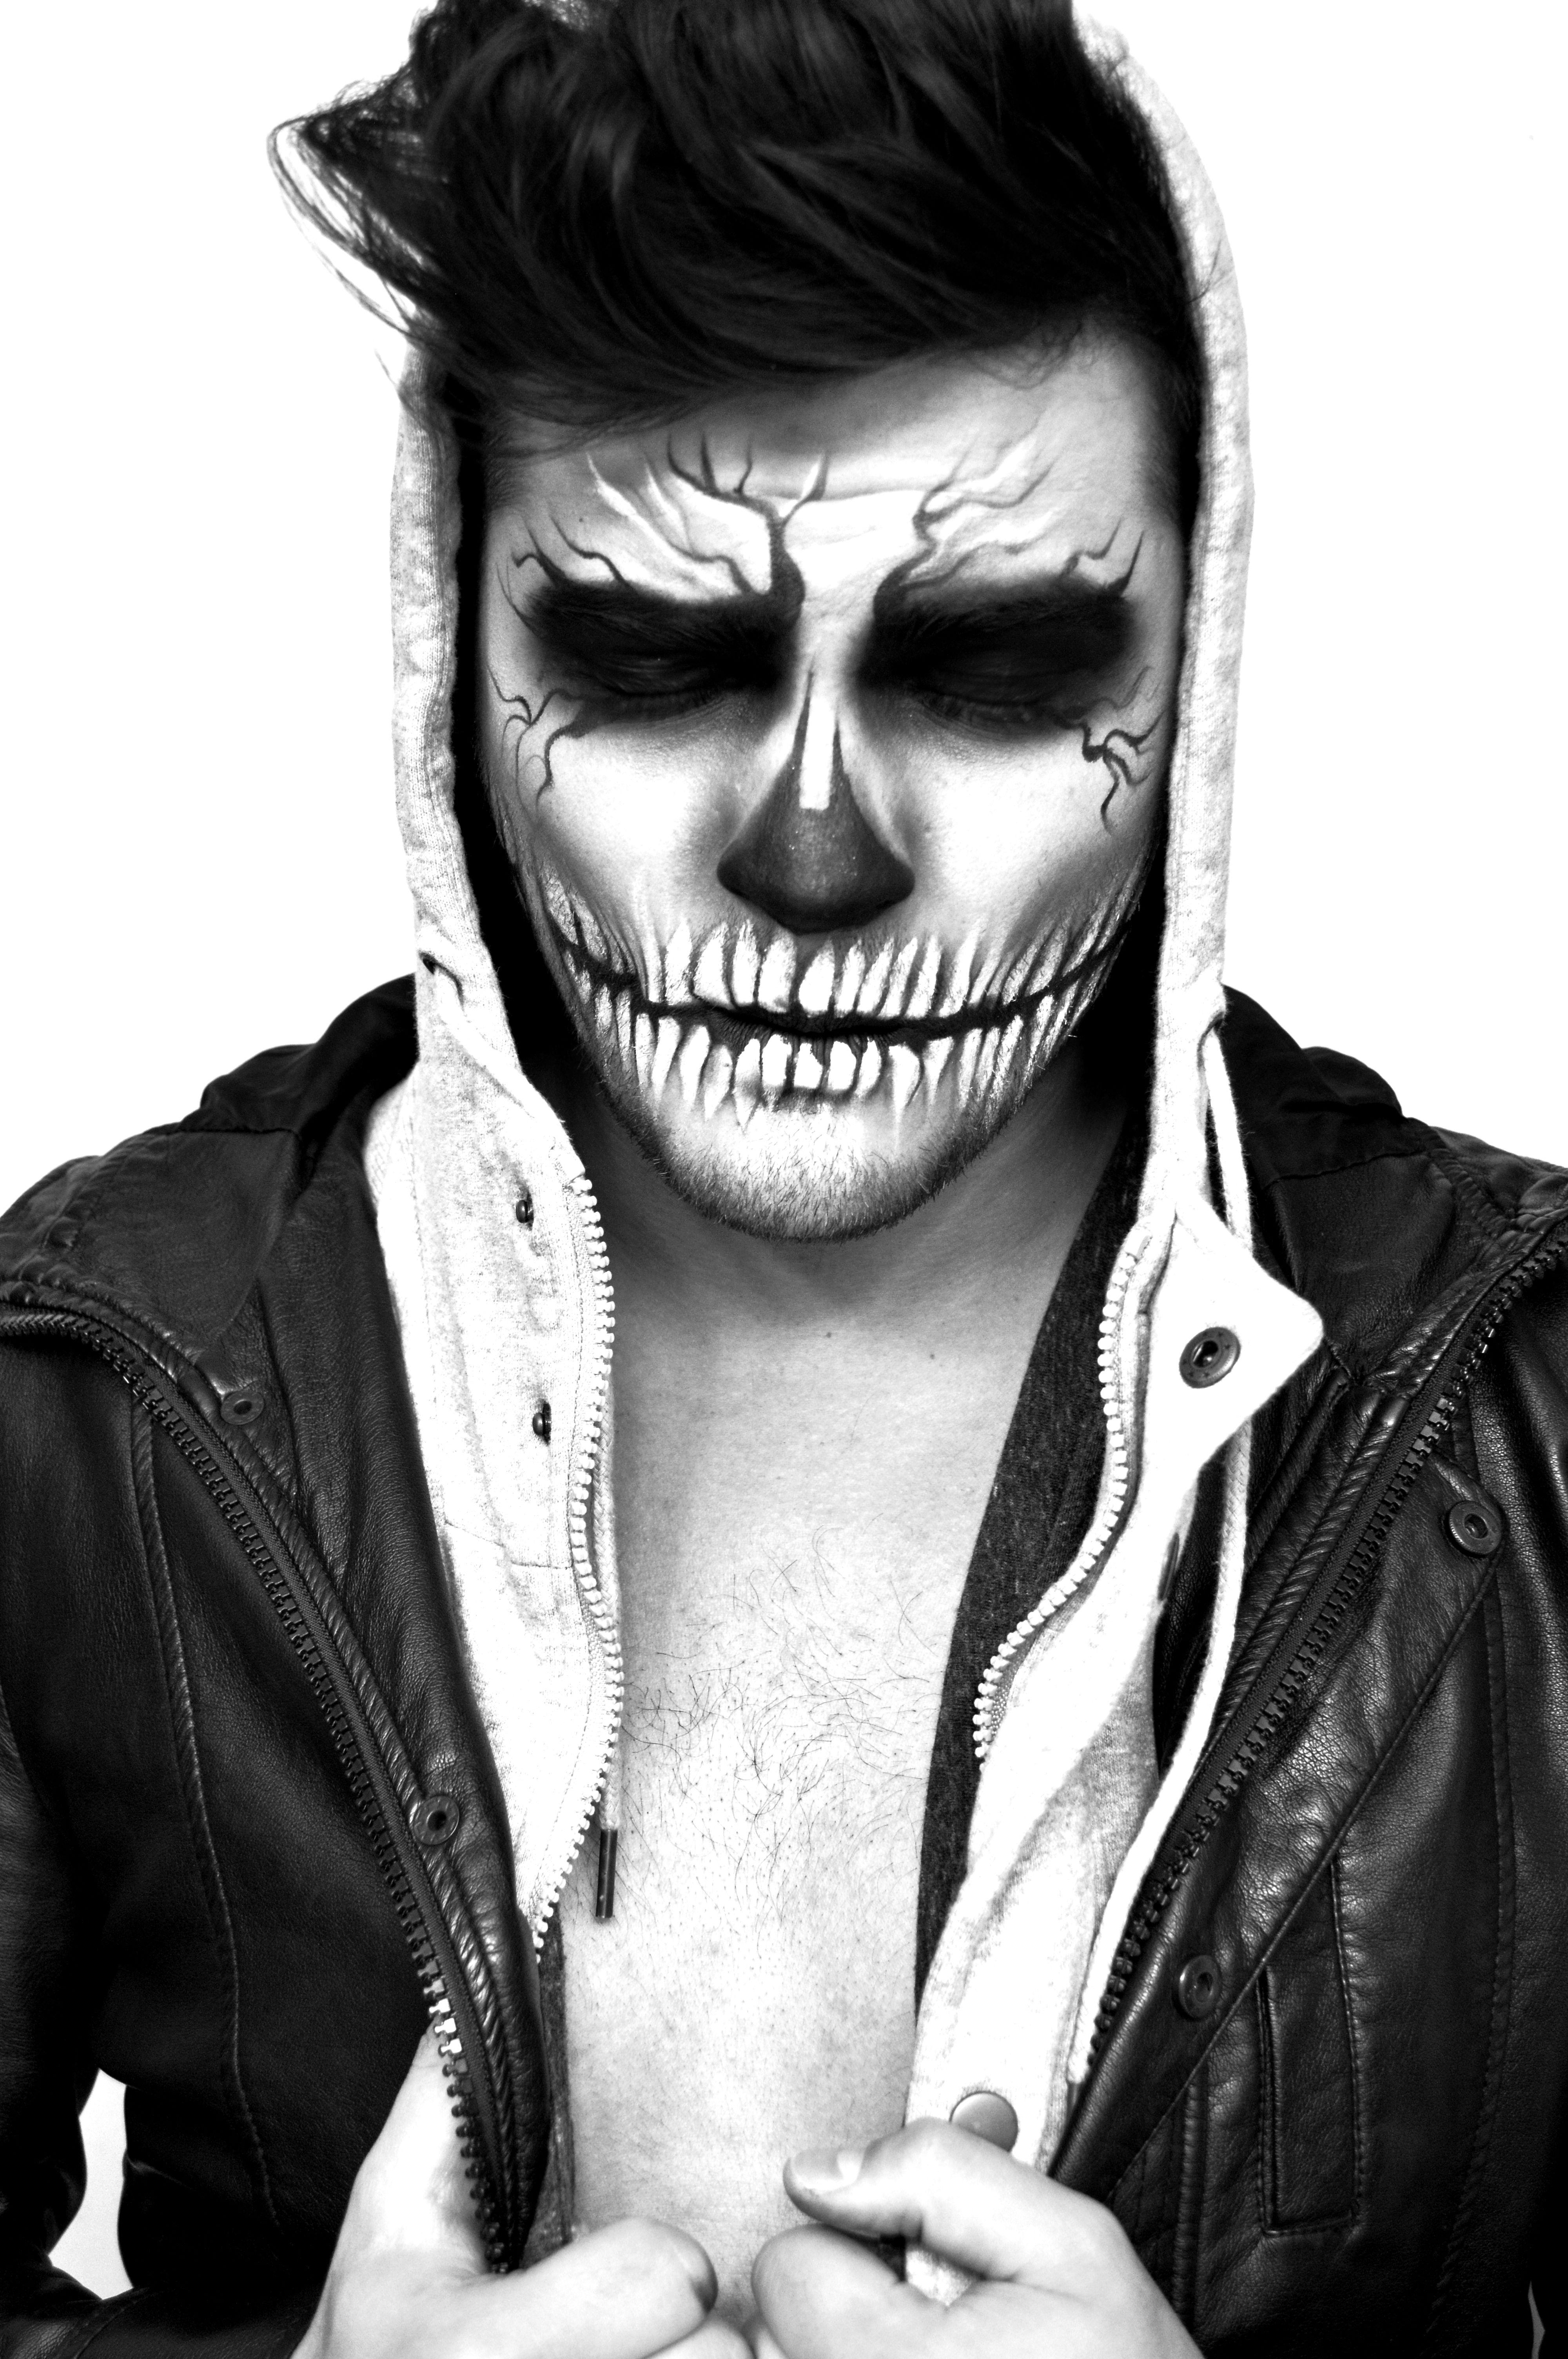 skull makeup by alex jonesfaction - Skull Faces Halloween